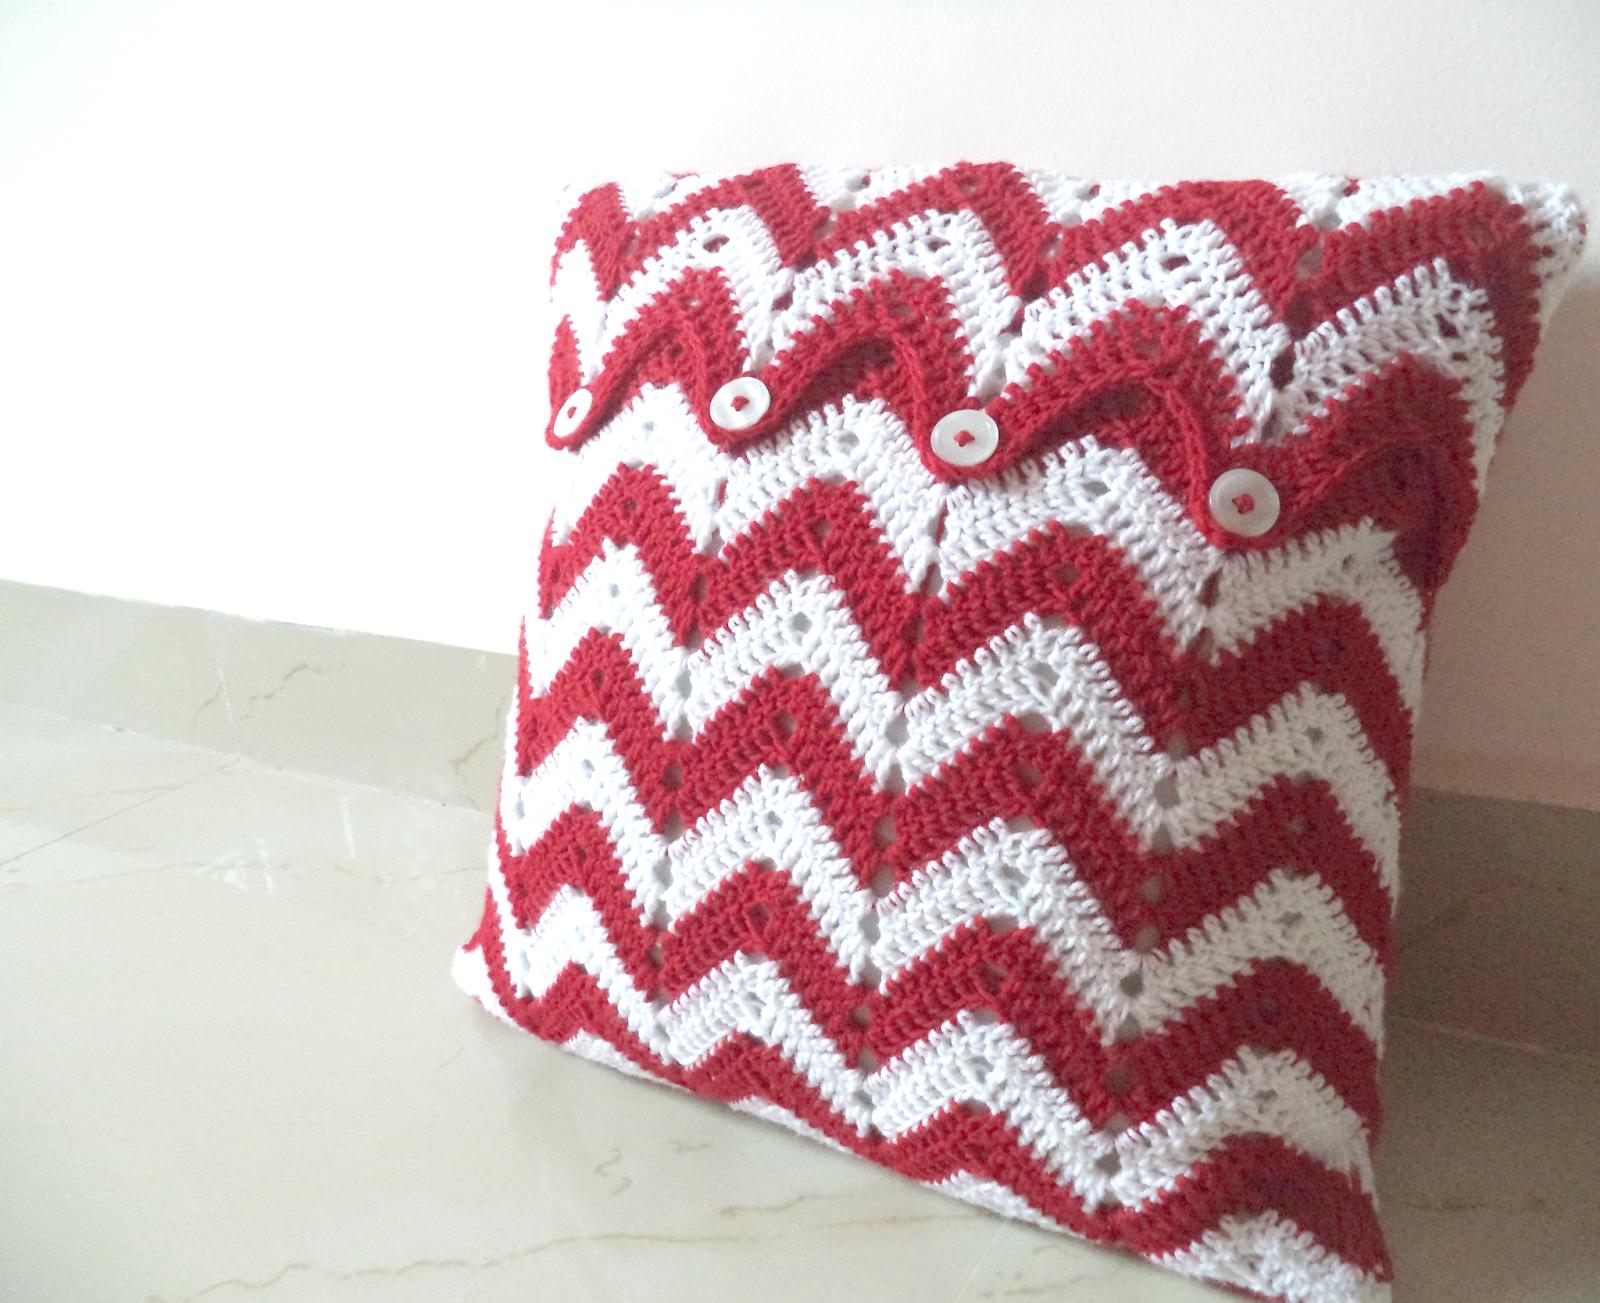 Crochet cushion cover free crochet pattern crochet cushion free crochet cushion cover free crochet pattern crochet cushion free crochet bankloansurffo Gallery